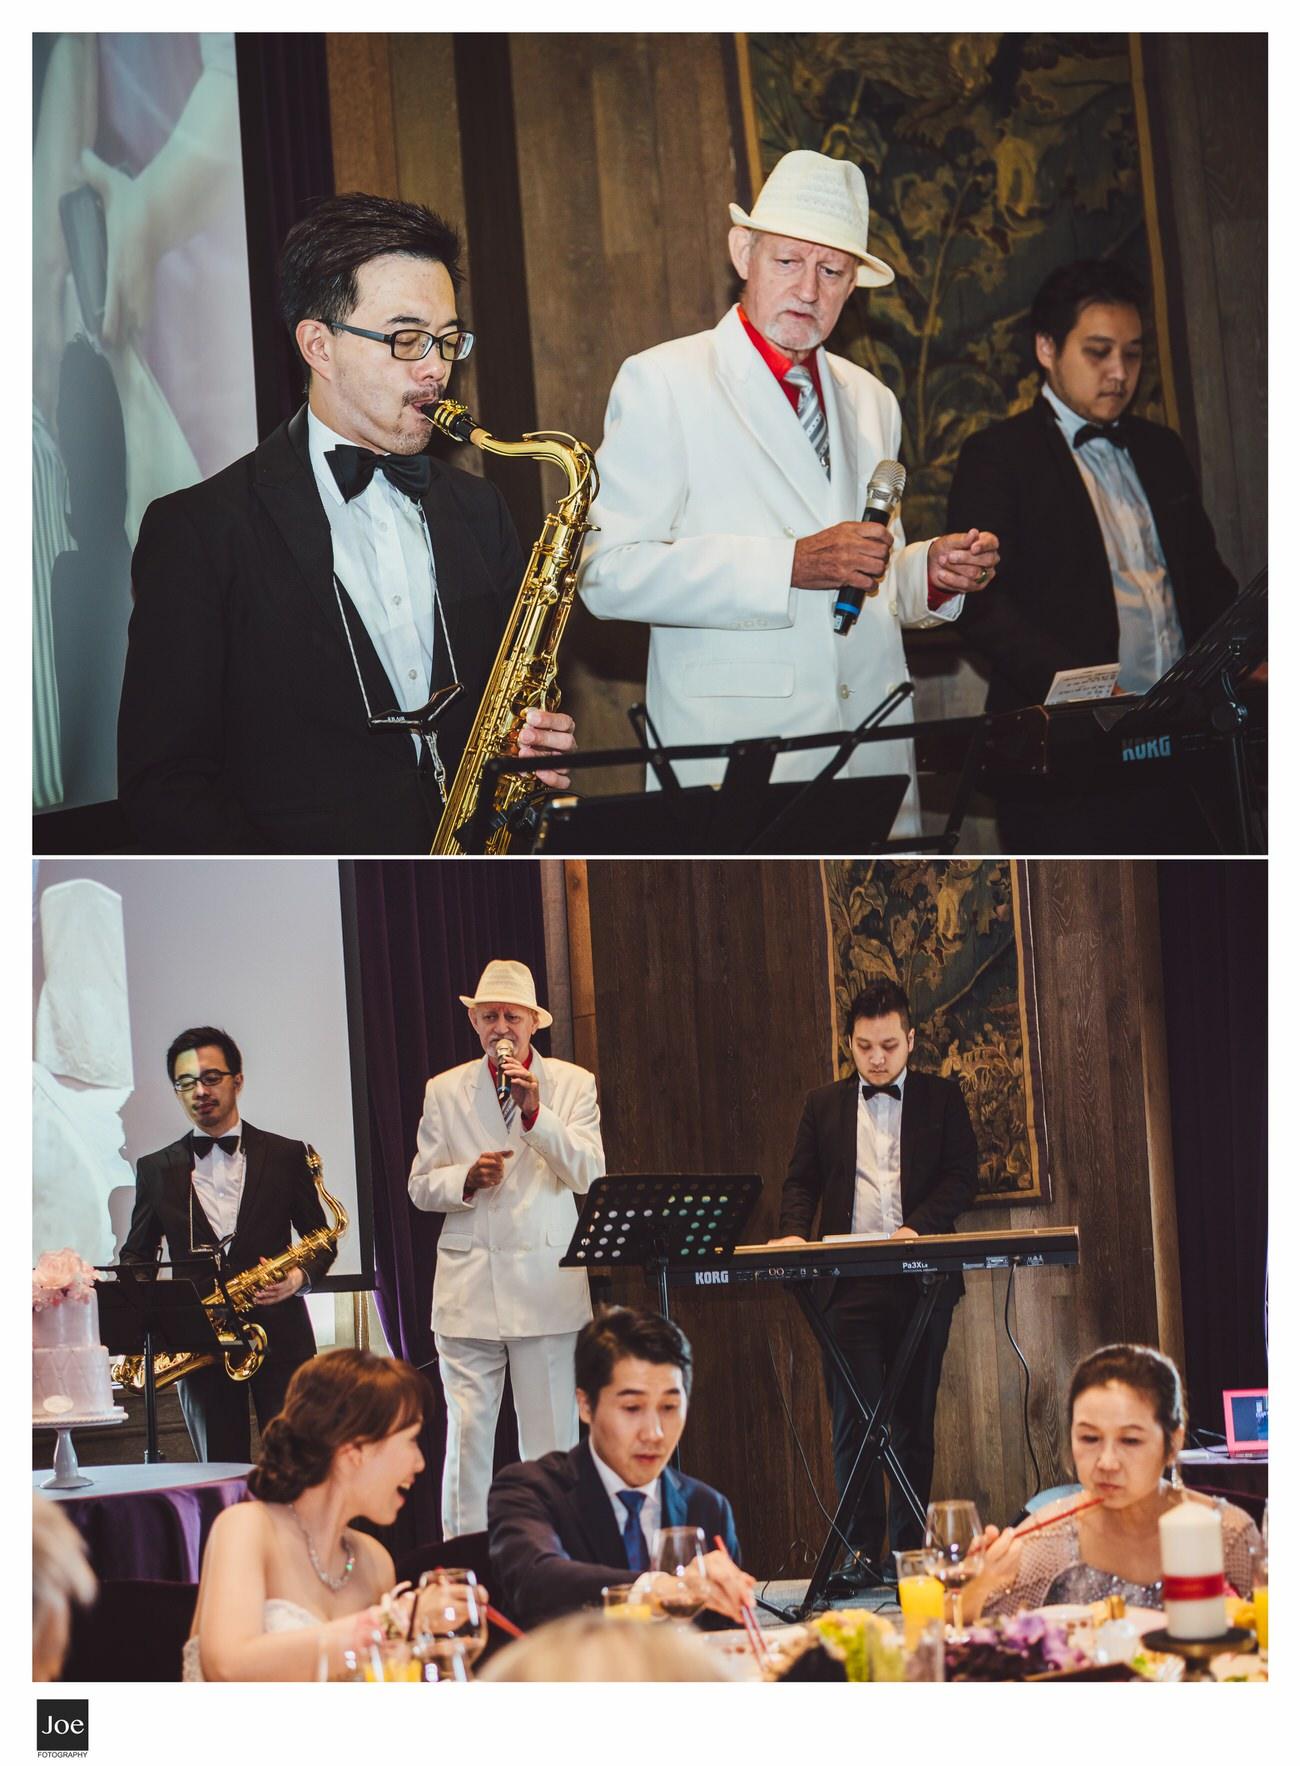 joe-fotography-wedding-photo-palais-de-chine-hotel-036.jpg